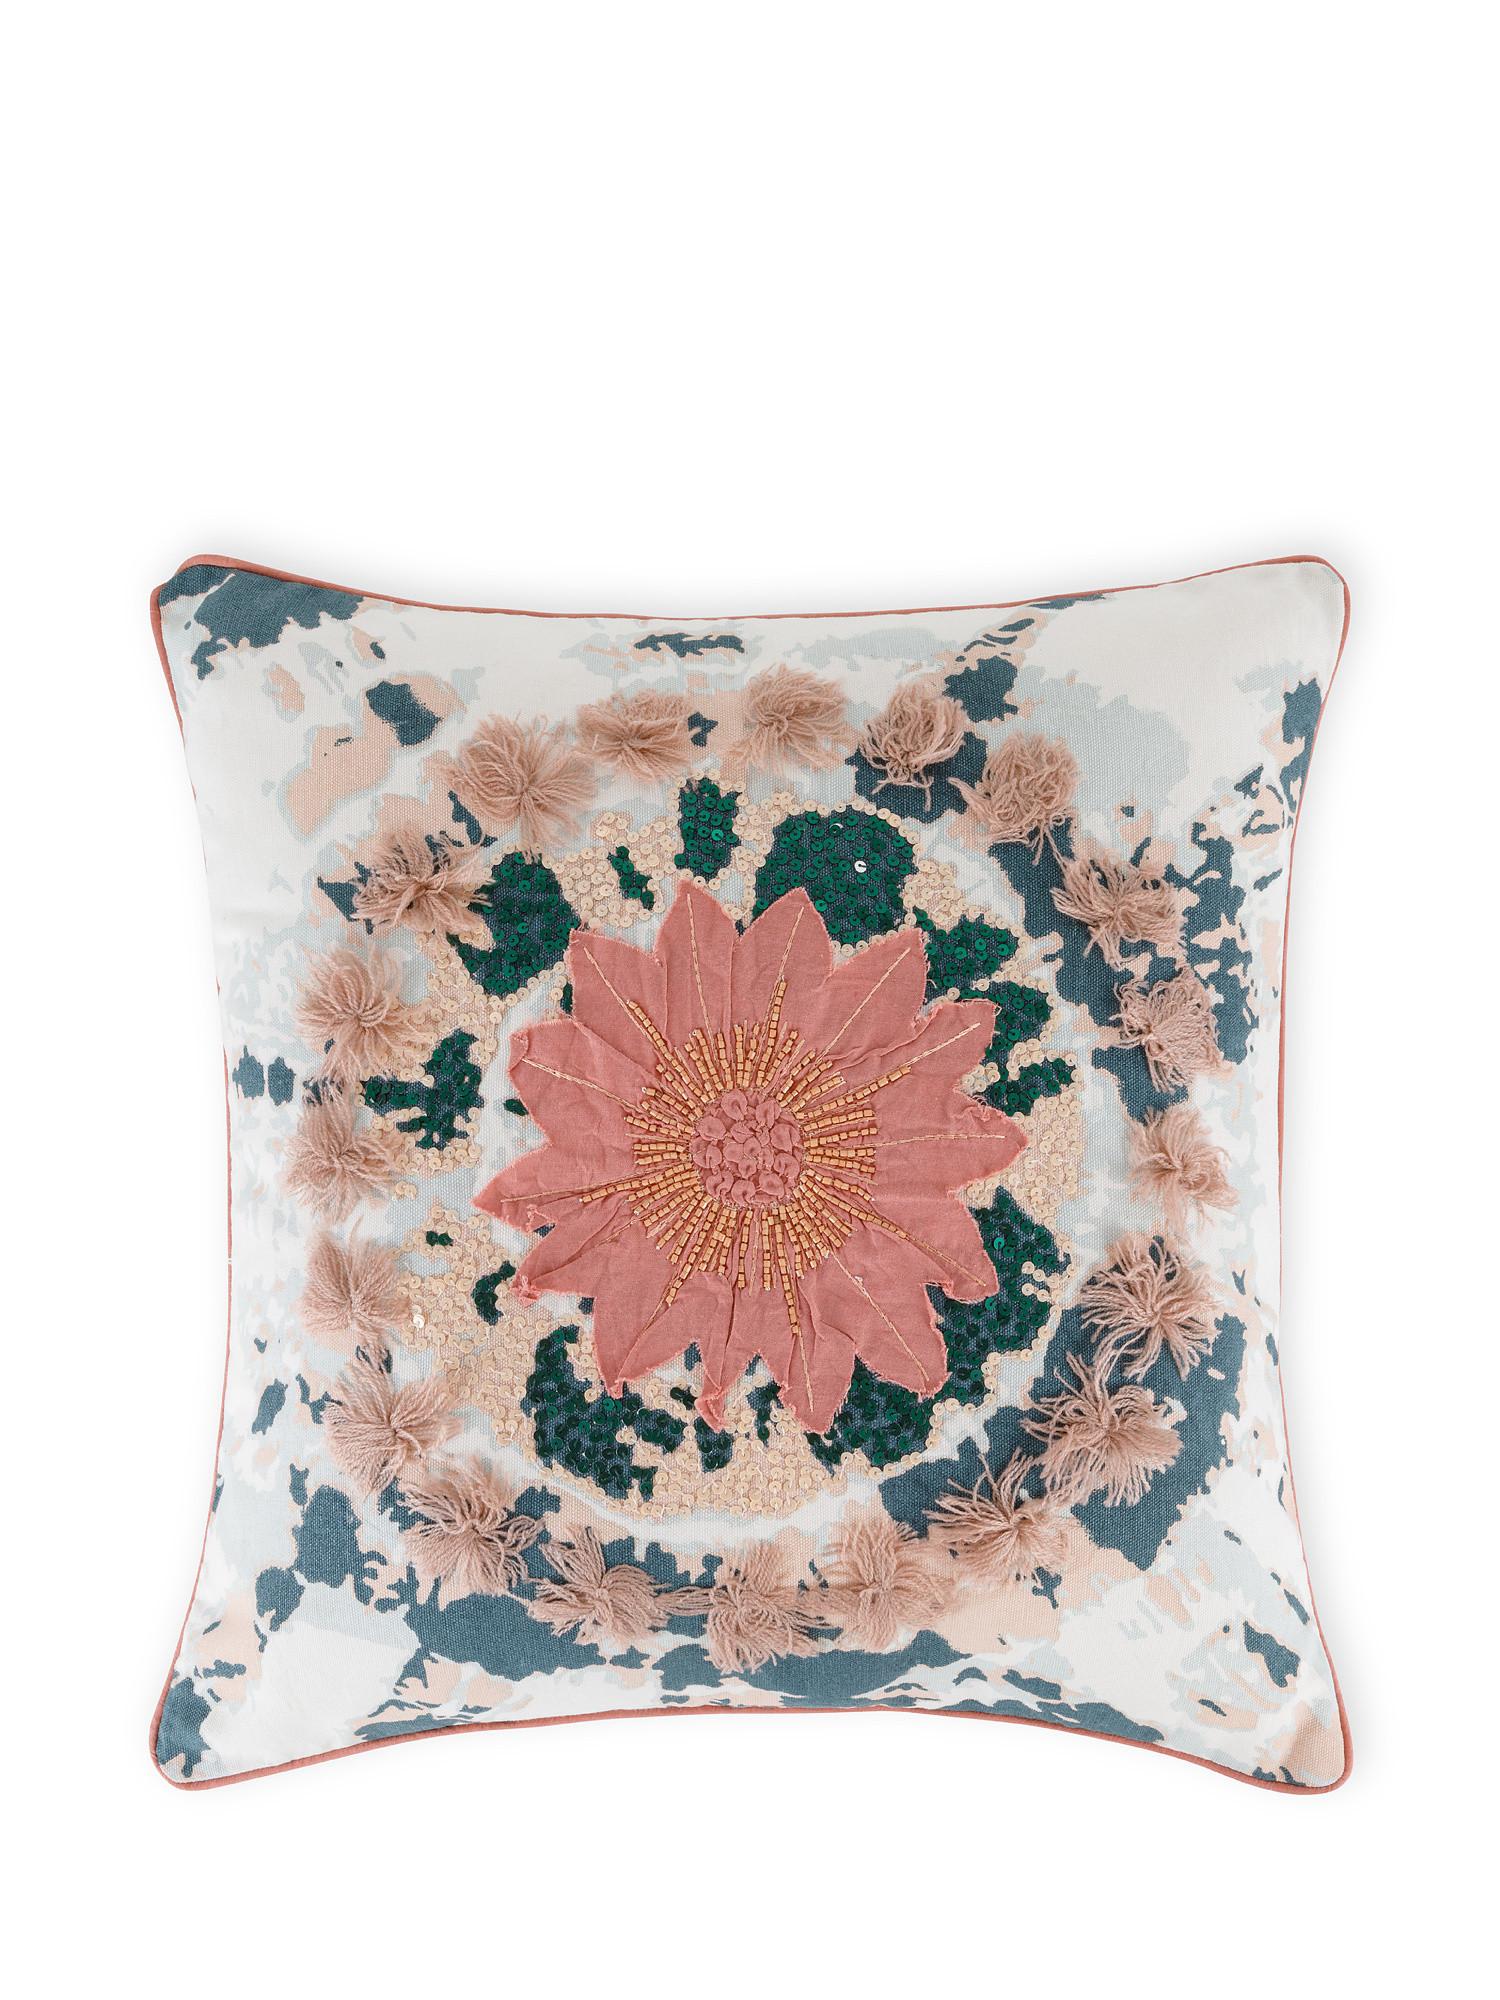 Cuscino cotone effetto tie dye 45x45cm, Multicolor, large image number 0